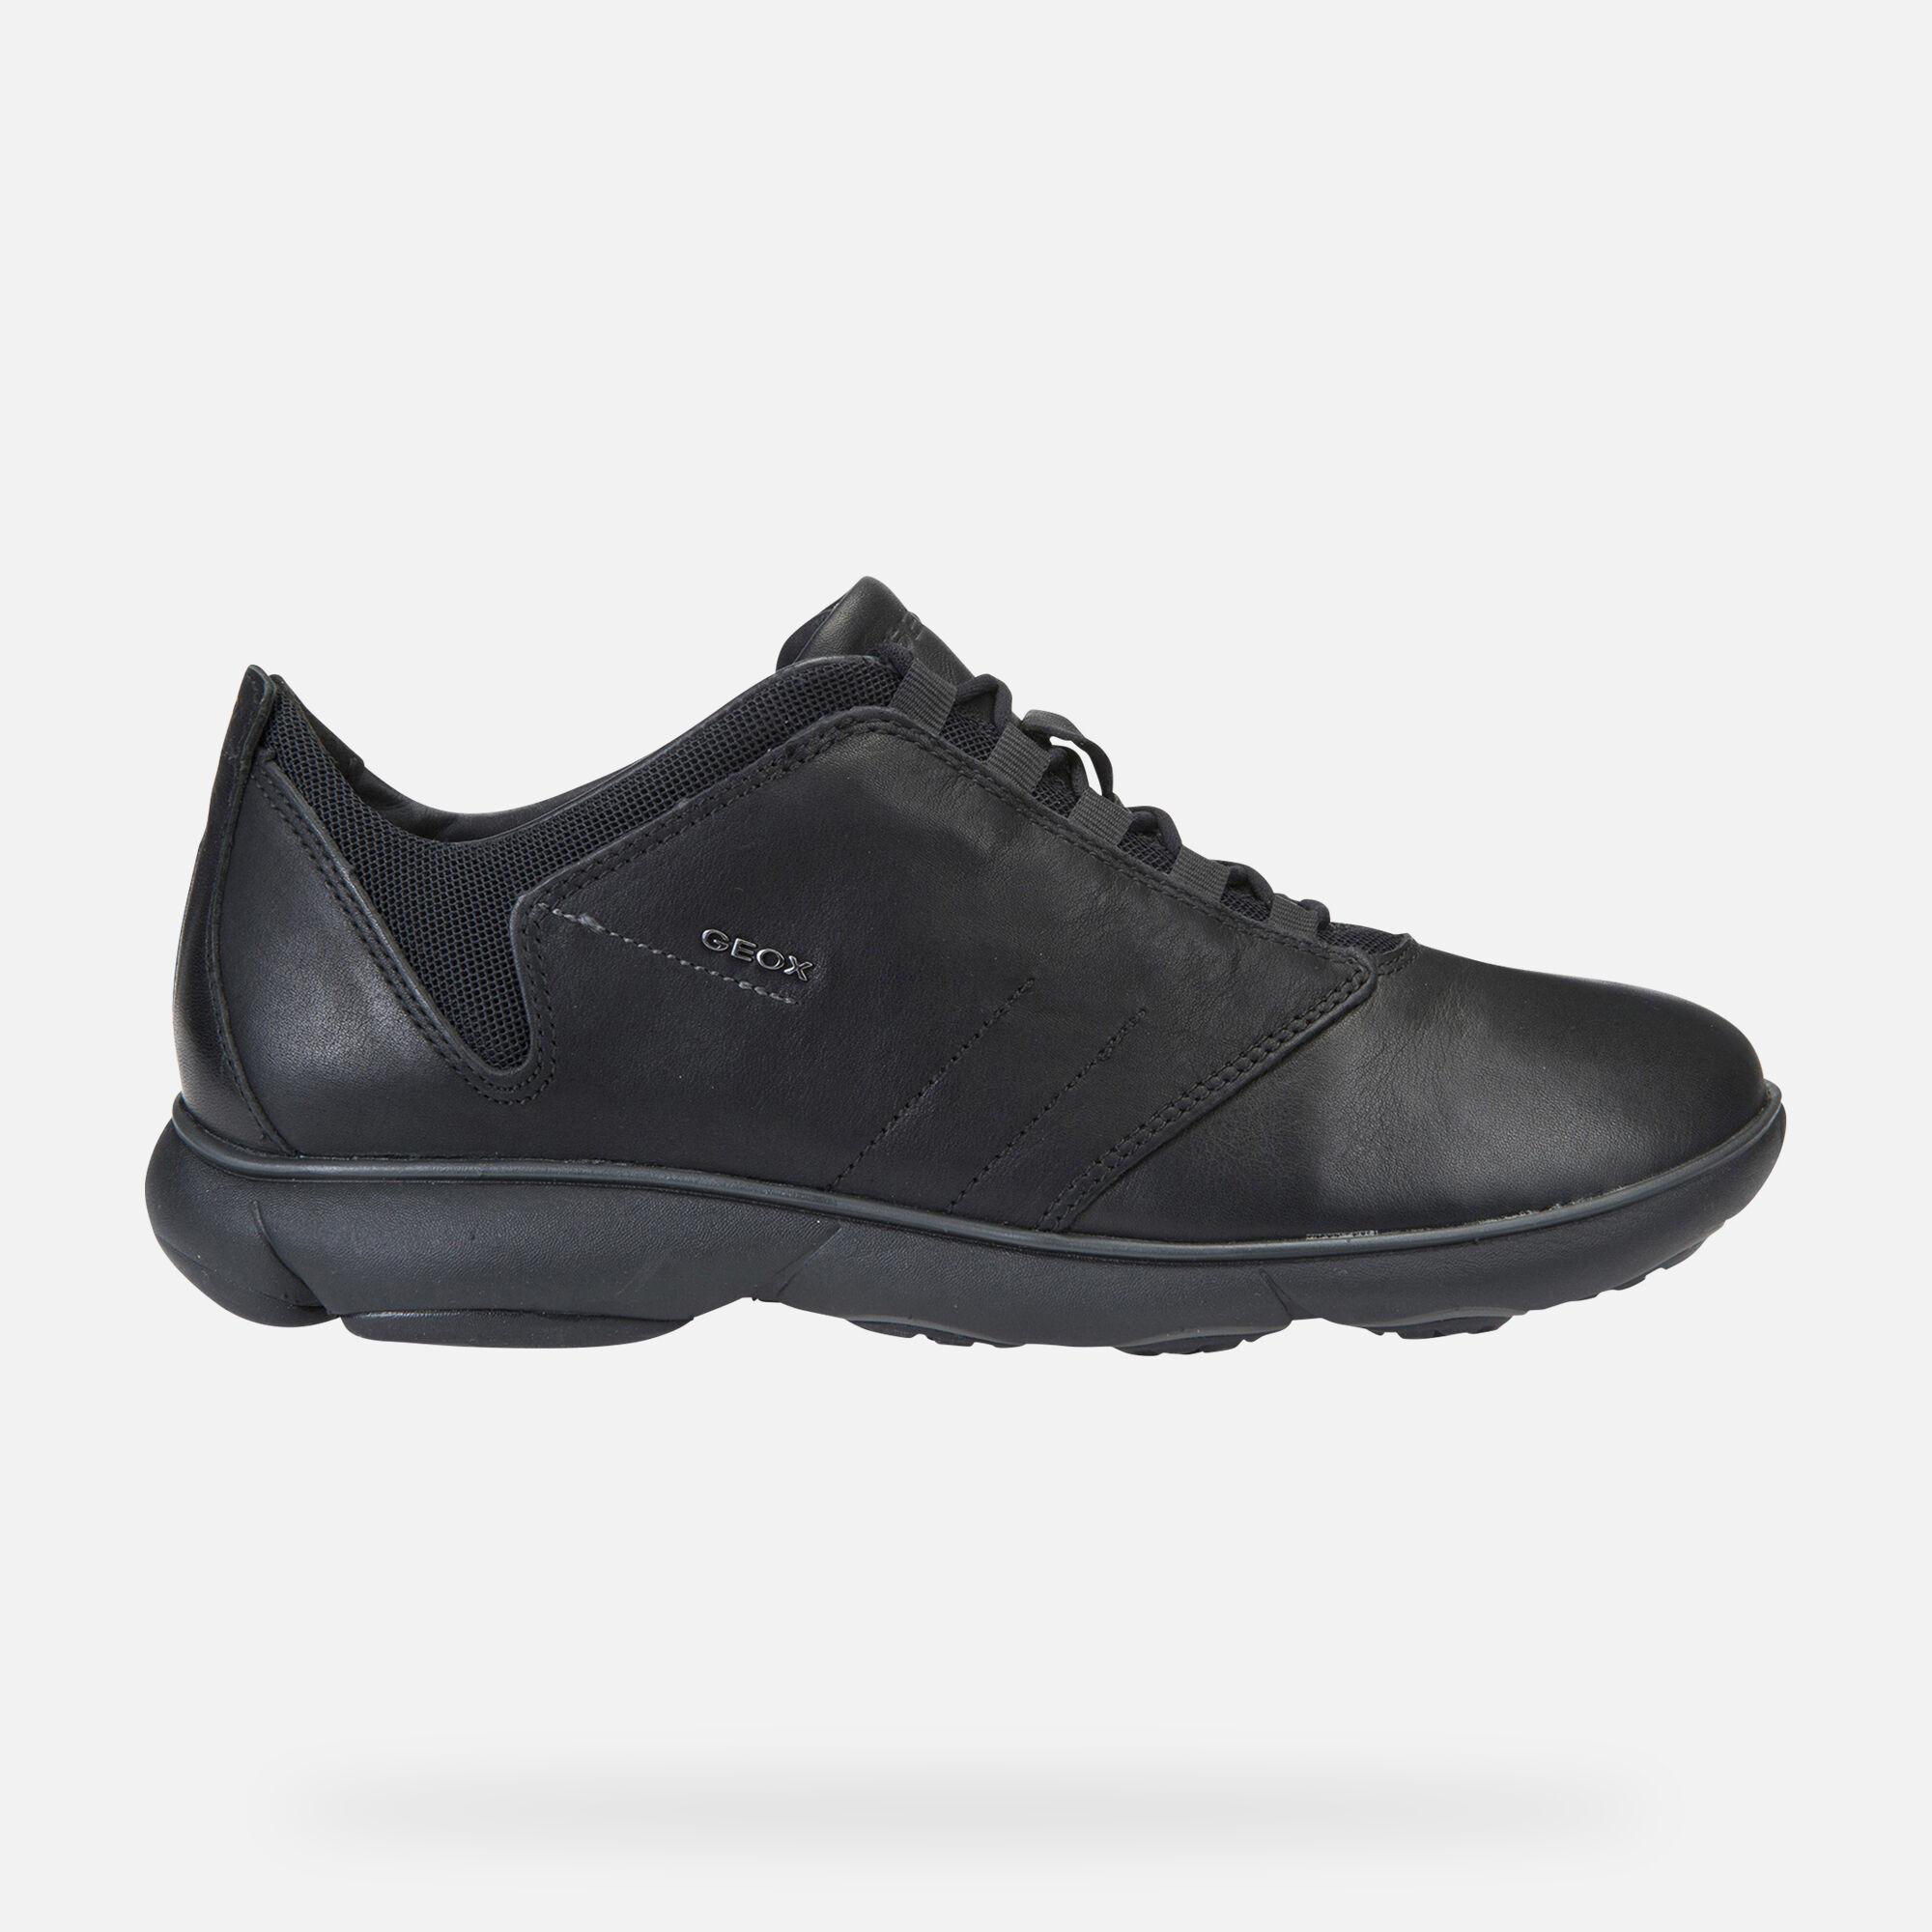 Geox NEBULA Man: Black Sneakers | Geox